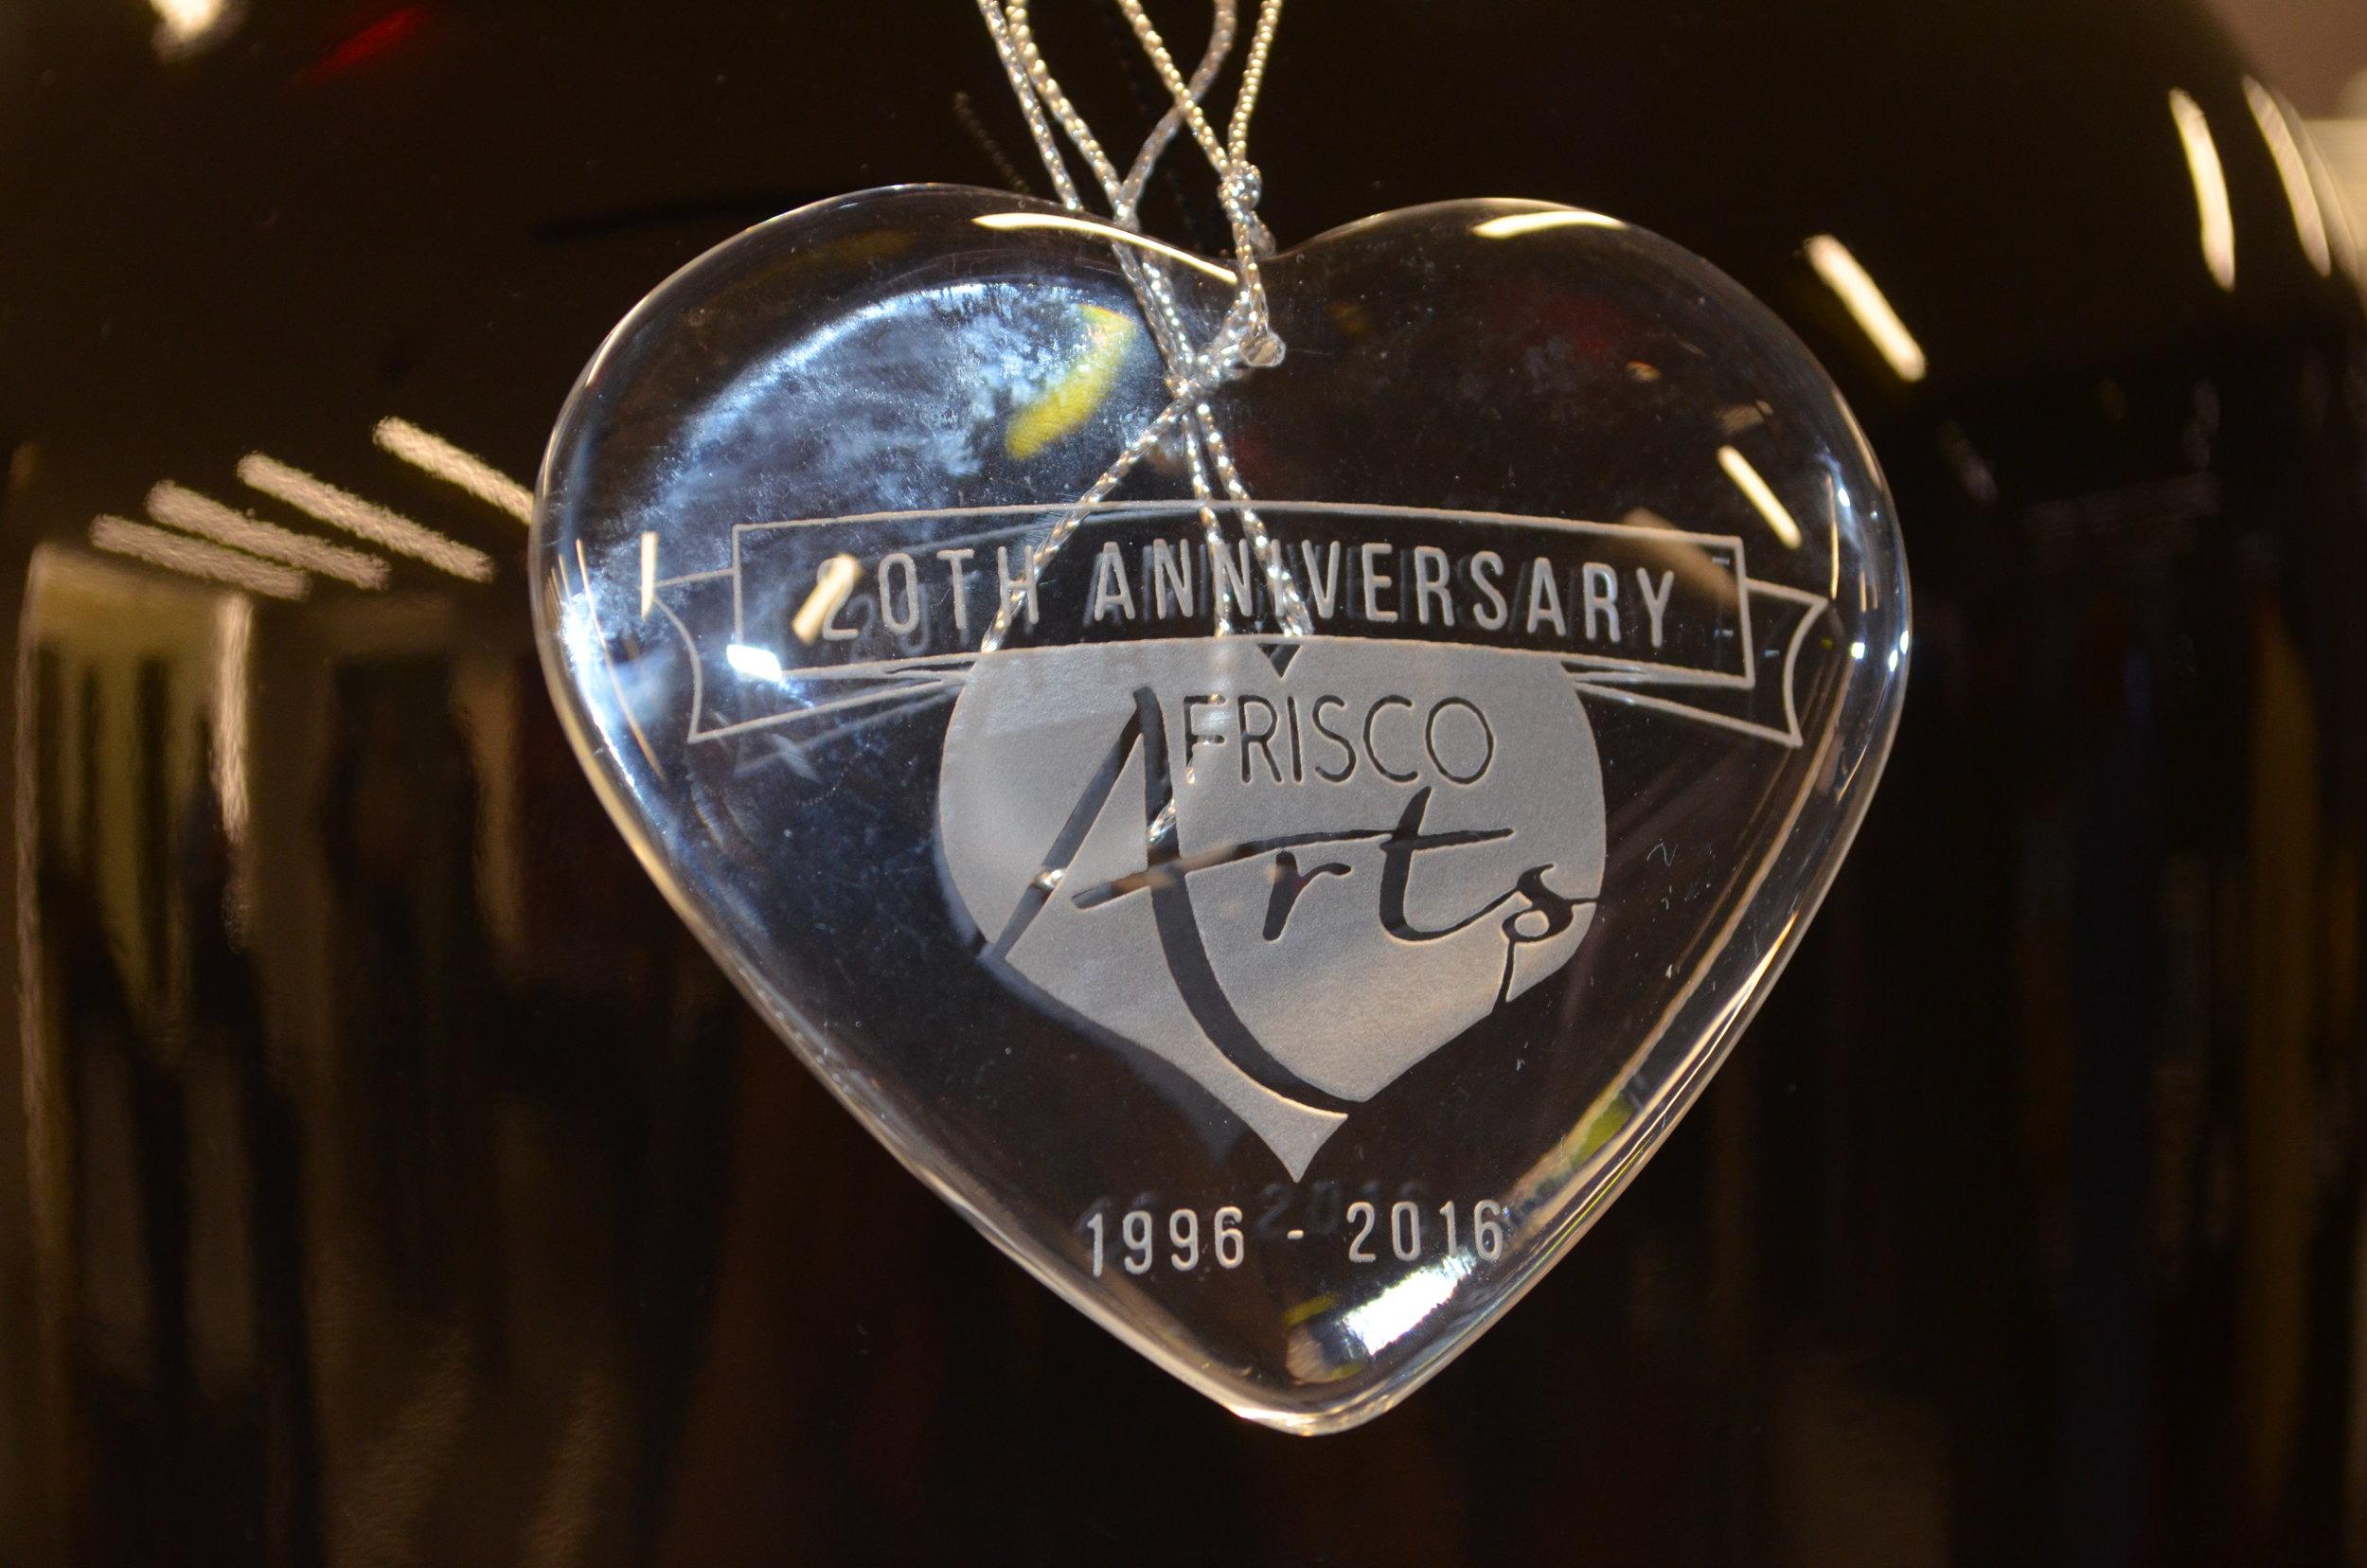 Frisco-Arts-29th-Anniversary-heart-belveal.JPG